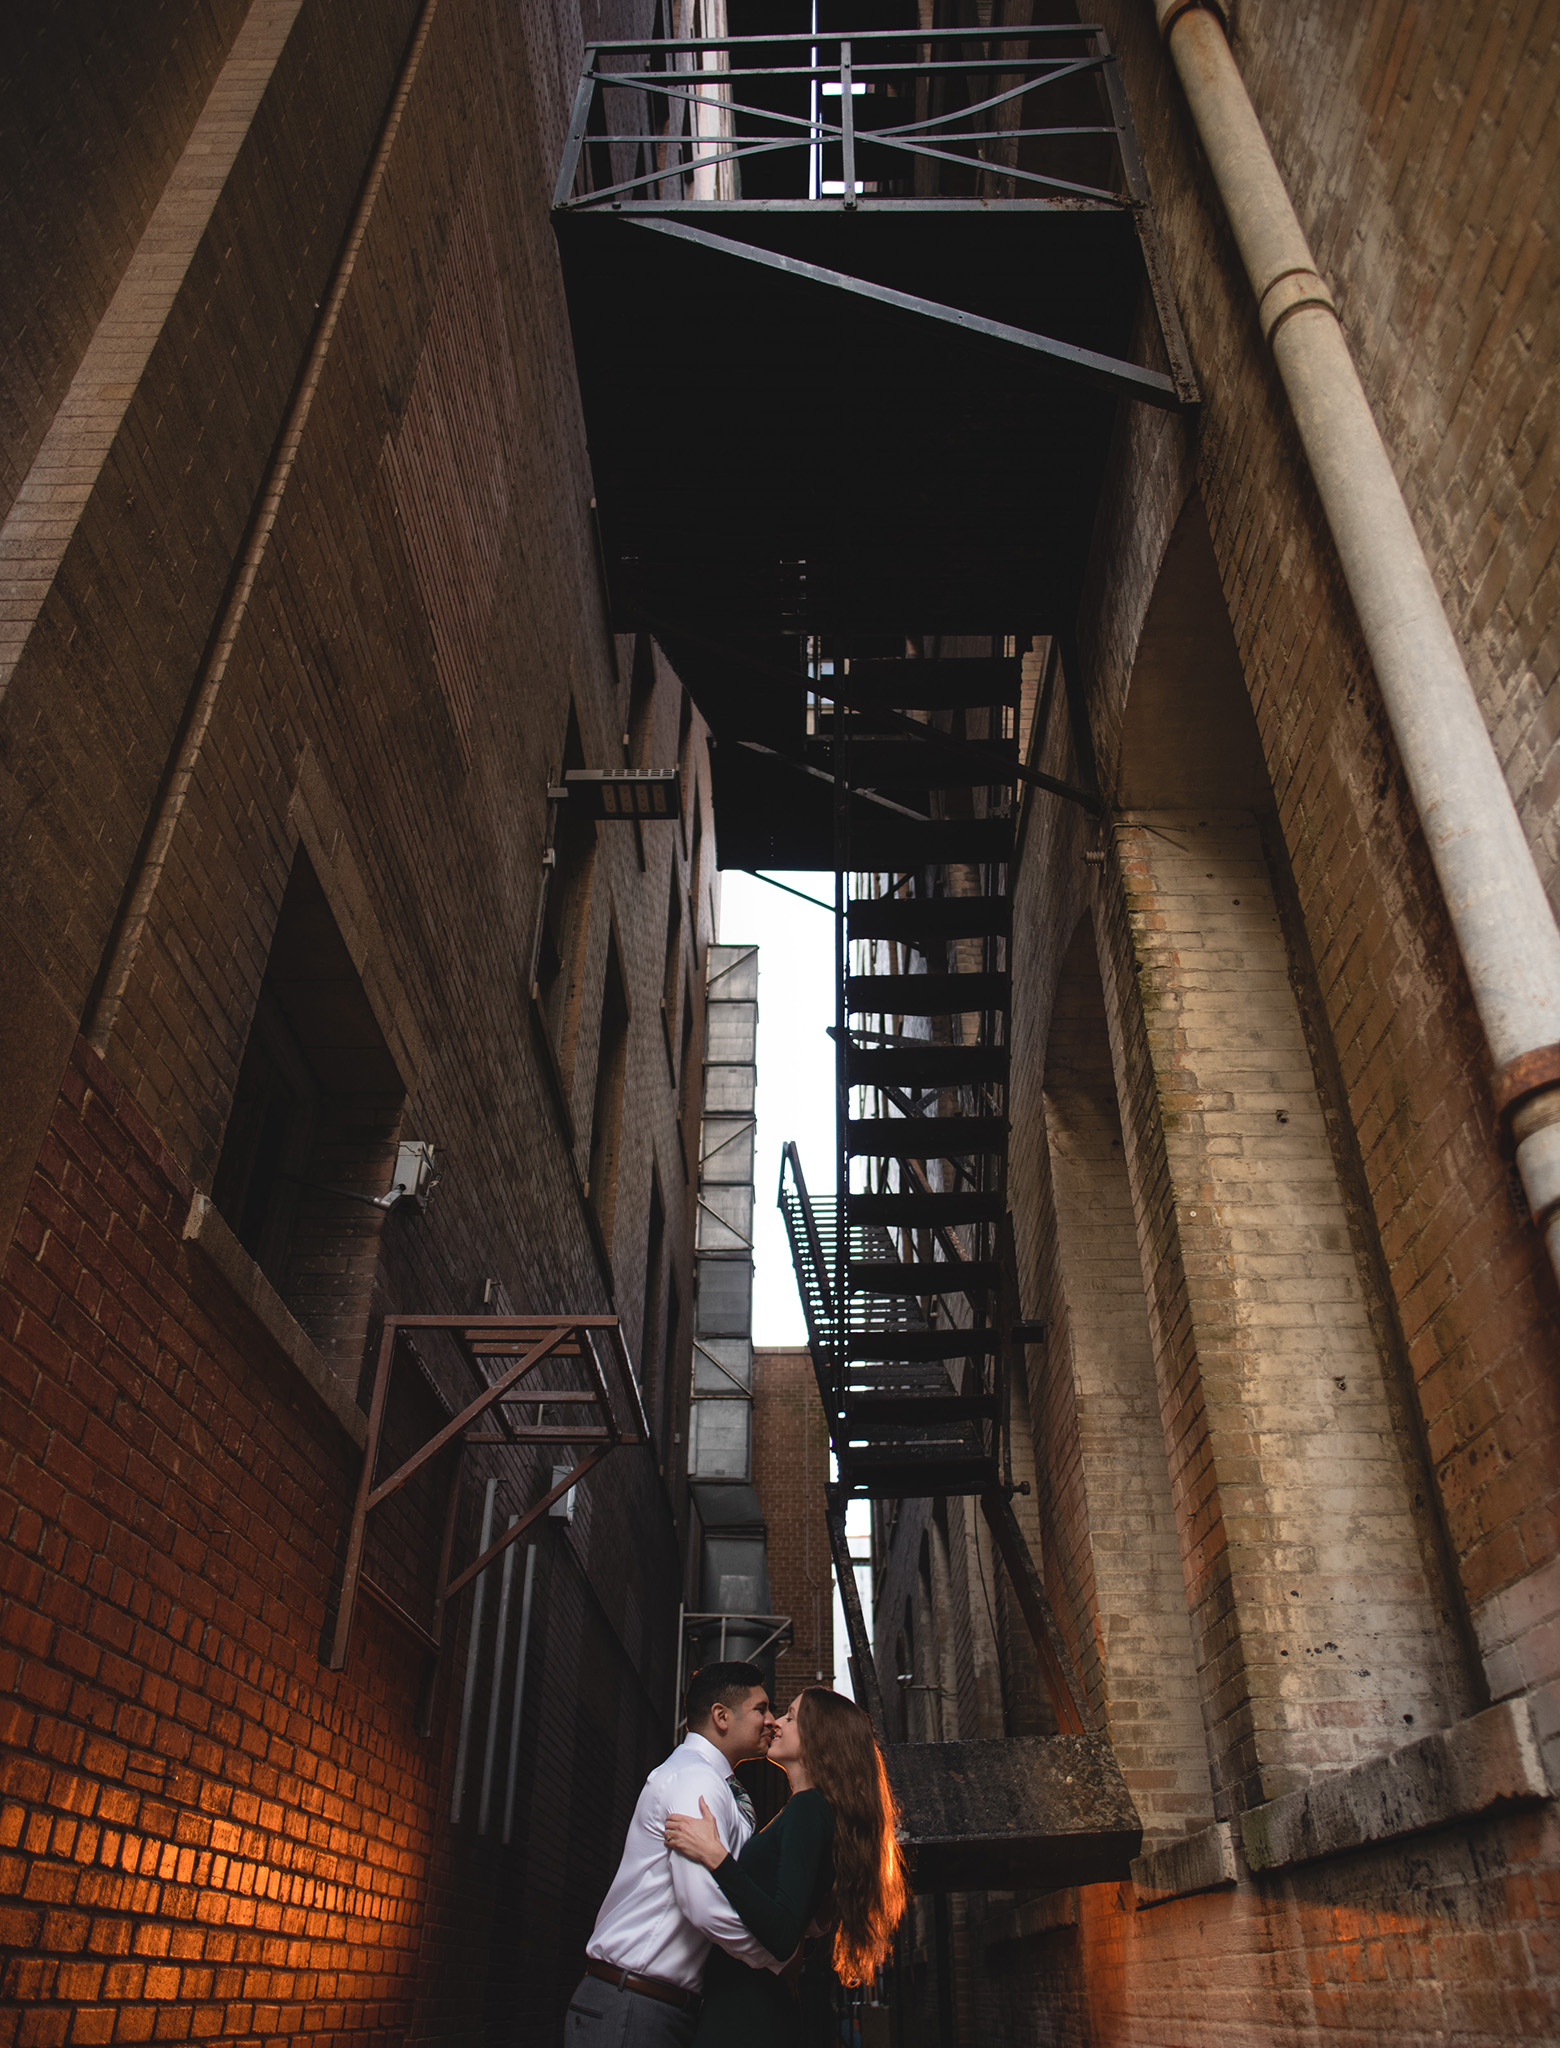 Houston-lifestyle-downtown-main-street-urban-classy-engagement-photographer